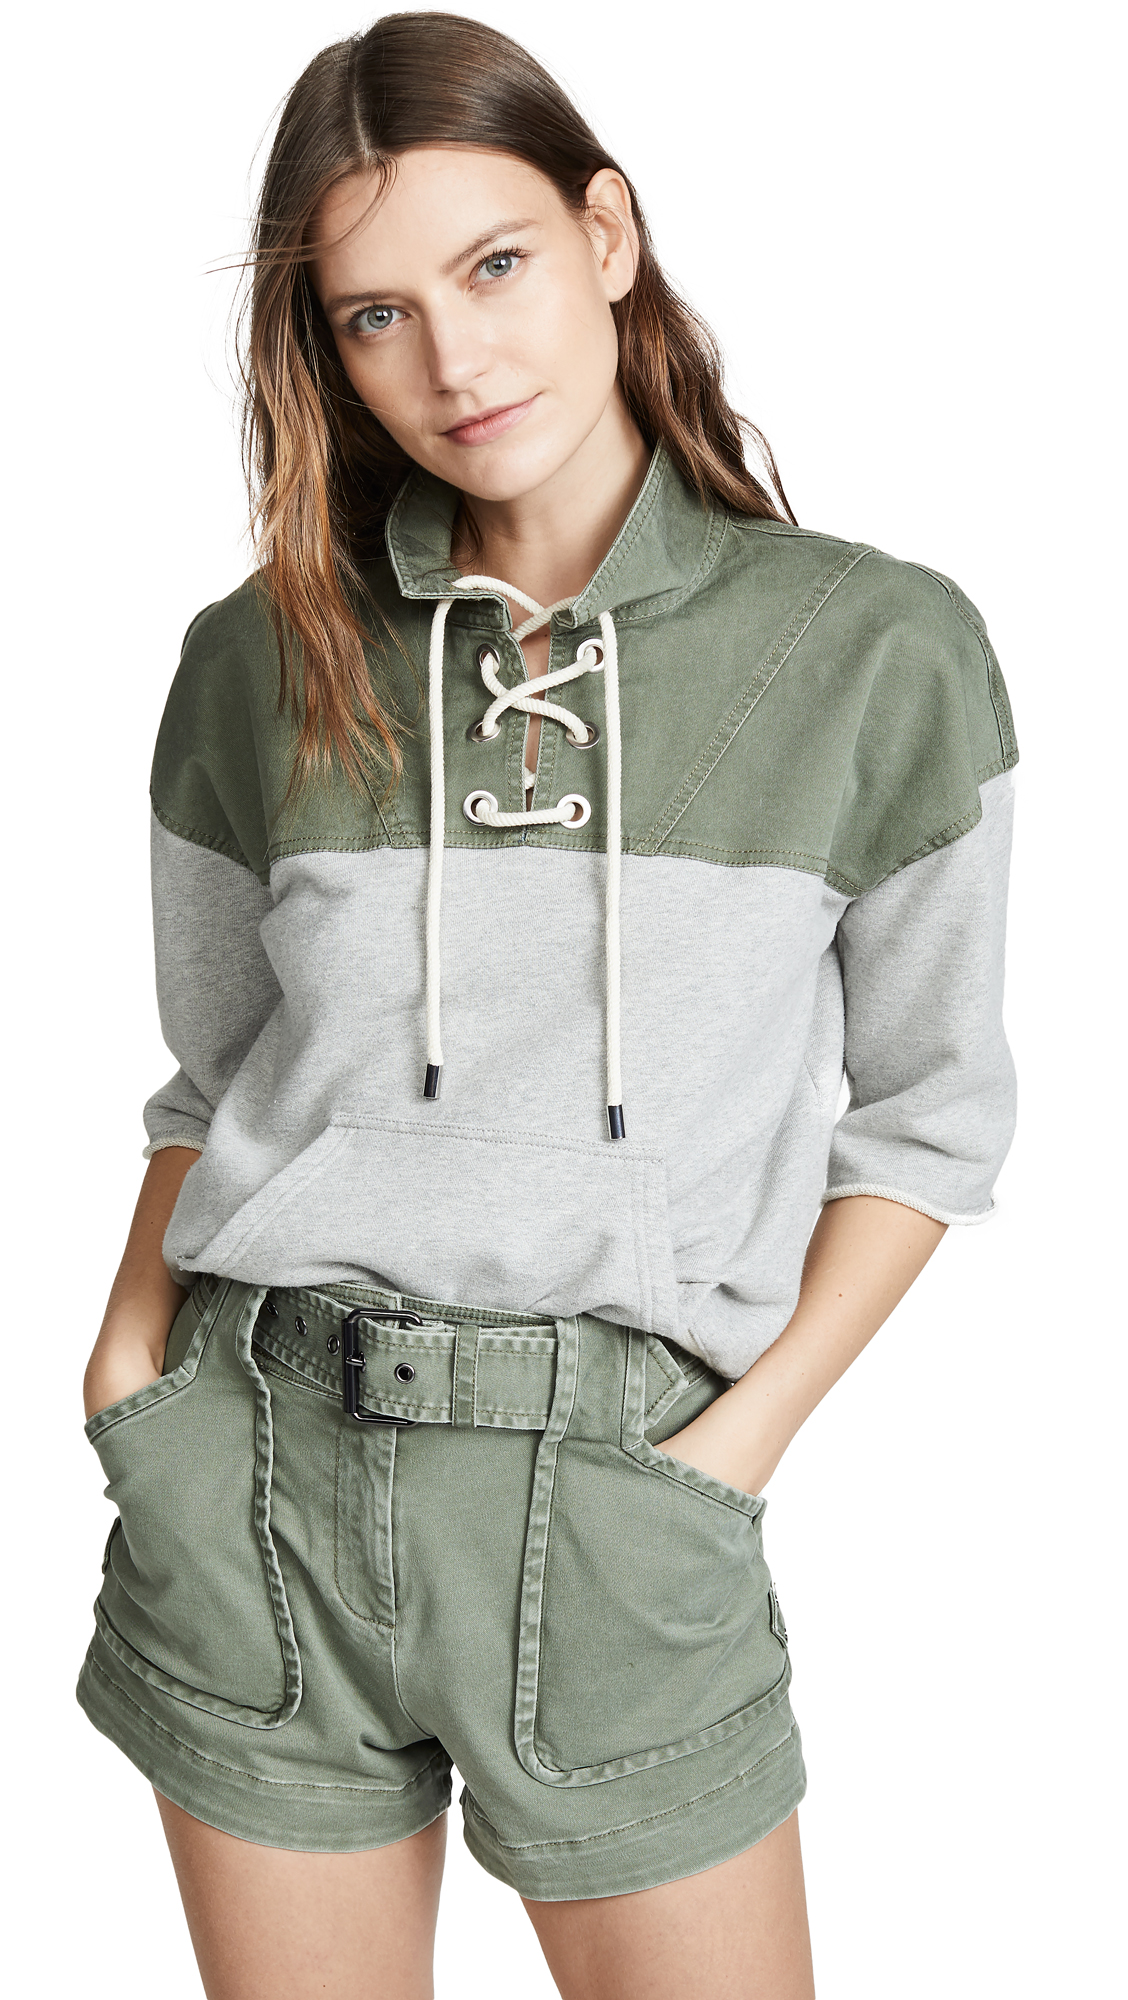 Derek Lam 10 Crosby Lace Up Sweatshirt - Army/Grey